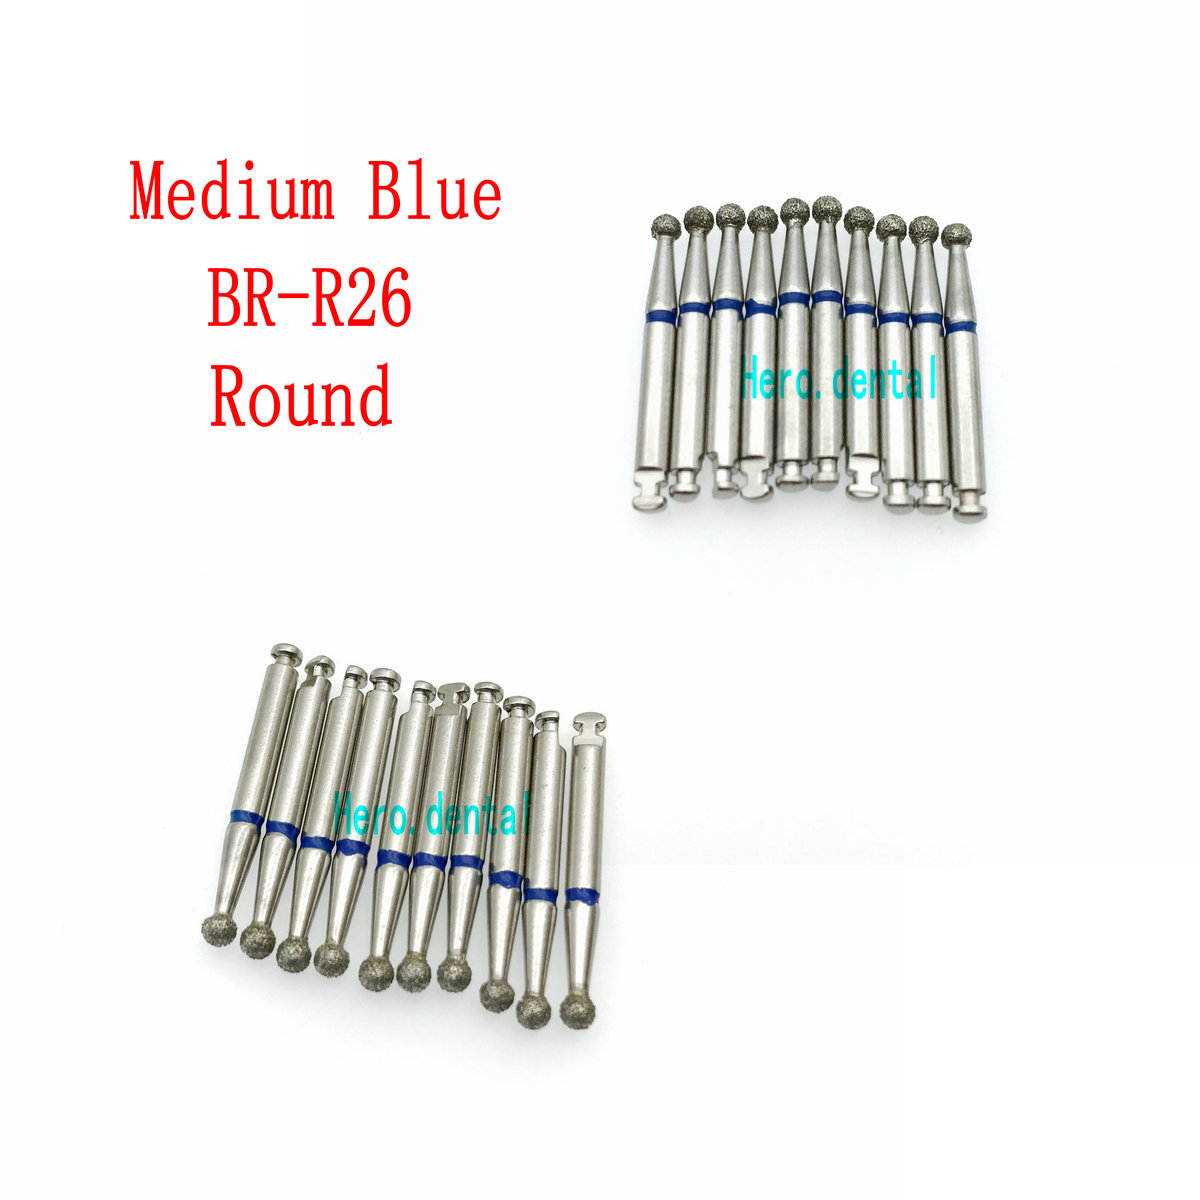 10Pcs Low Speed Dental Diamond Burs For RA 2.35mm Shank Handpiece Polisher Trimming Round Head Clinic Drill